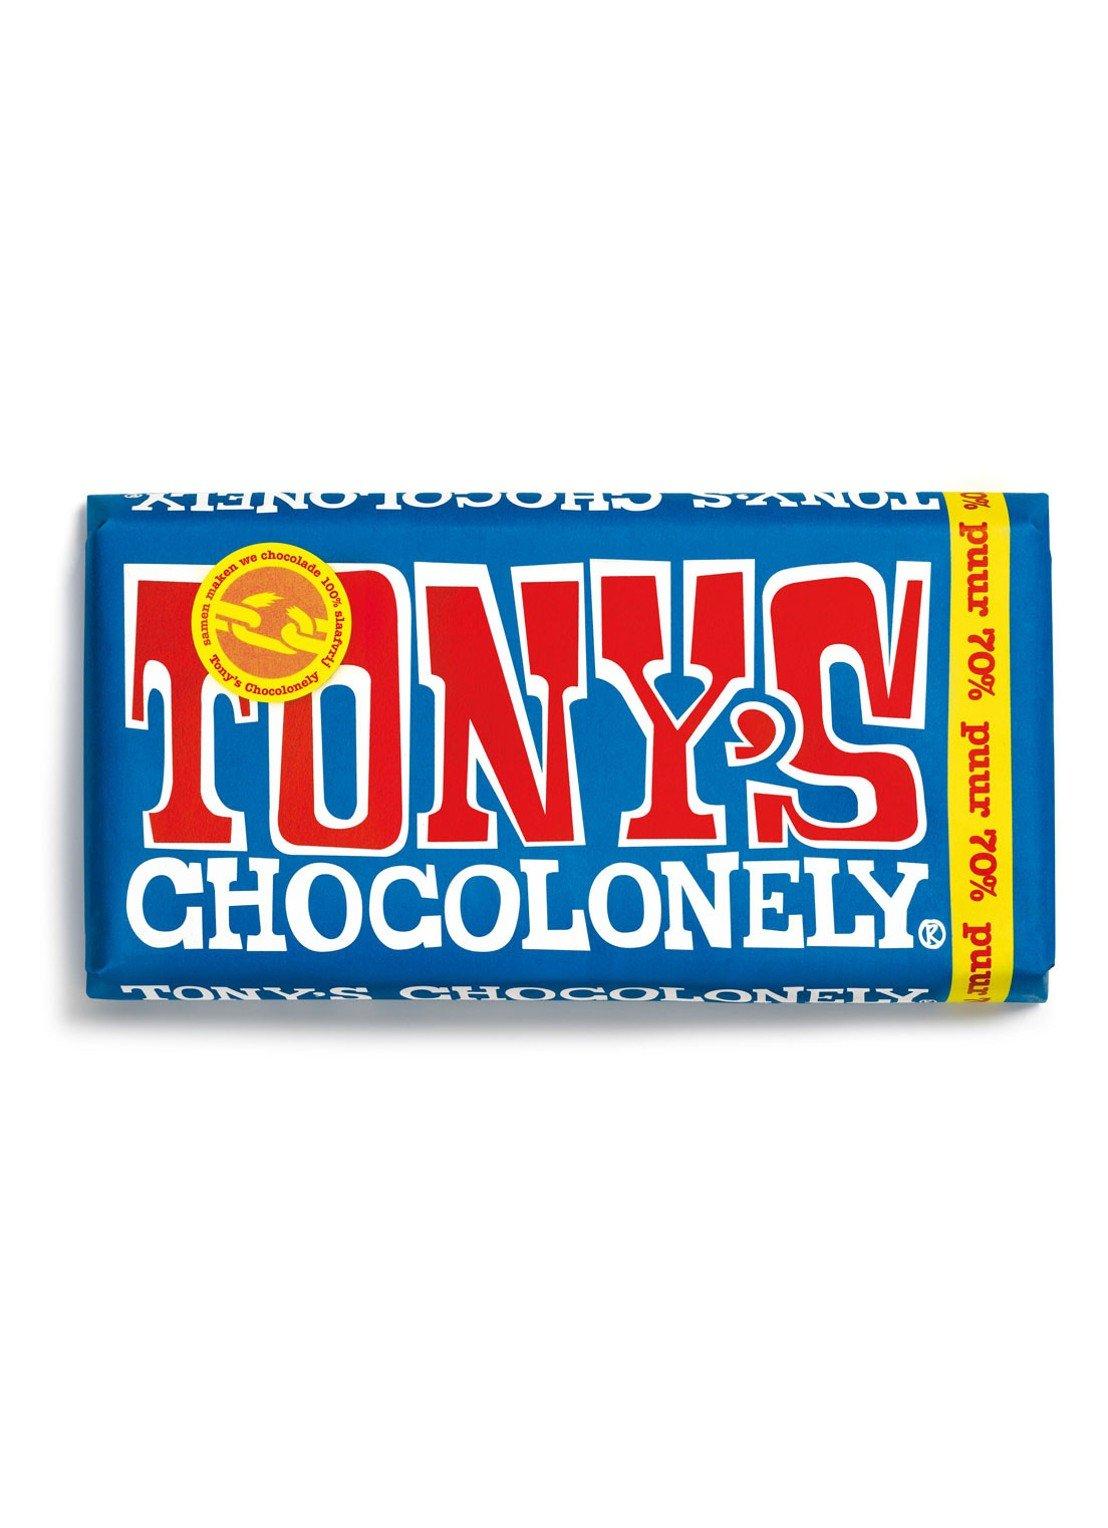 Tony's Chocolonely 70% puur De Bijenkorf